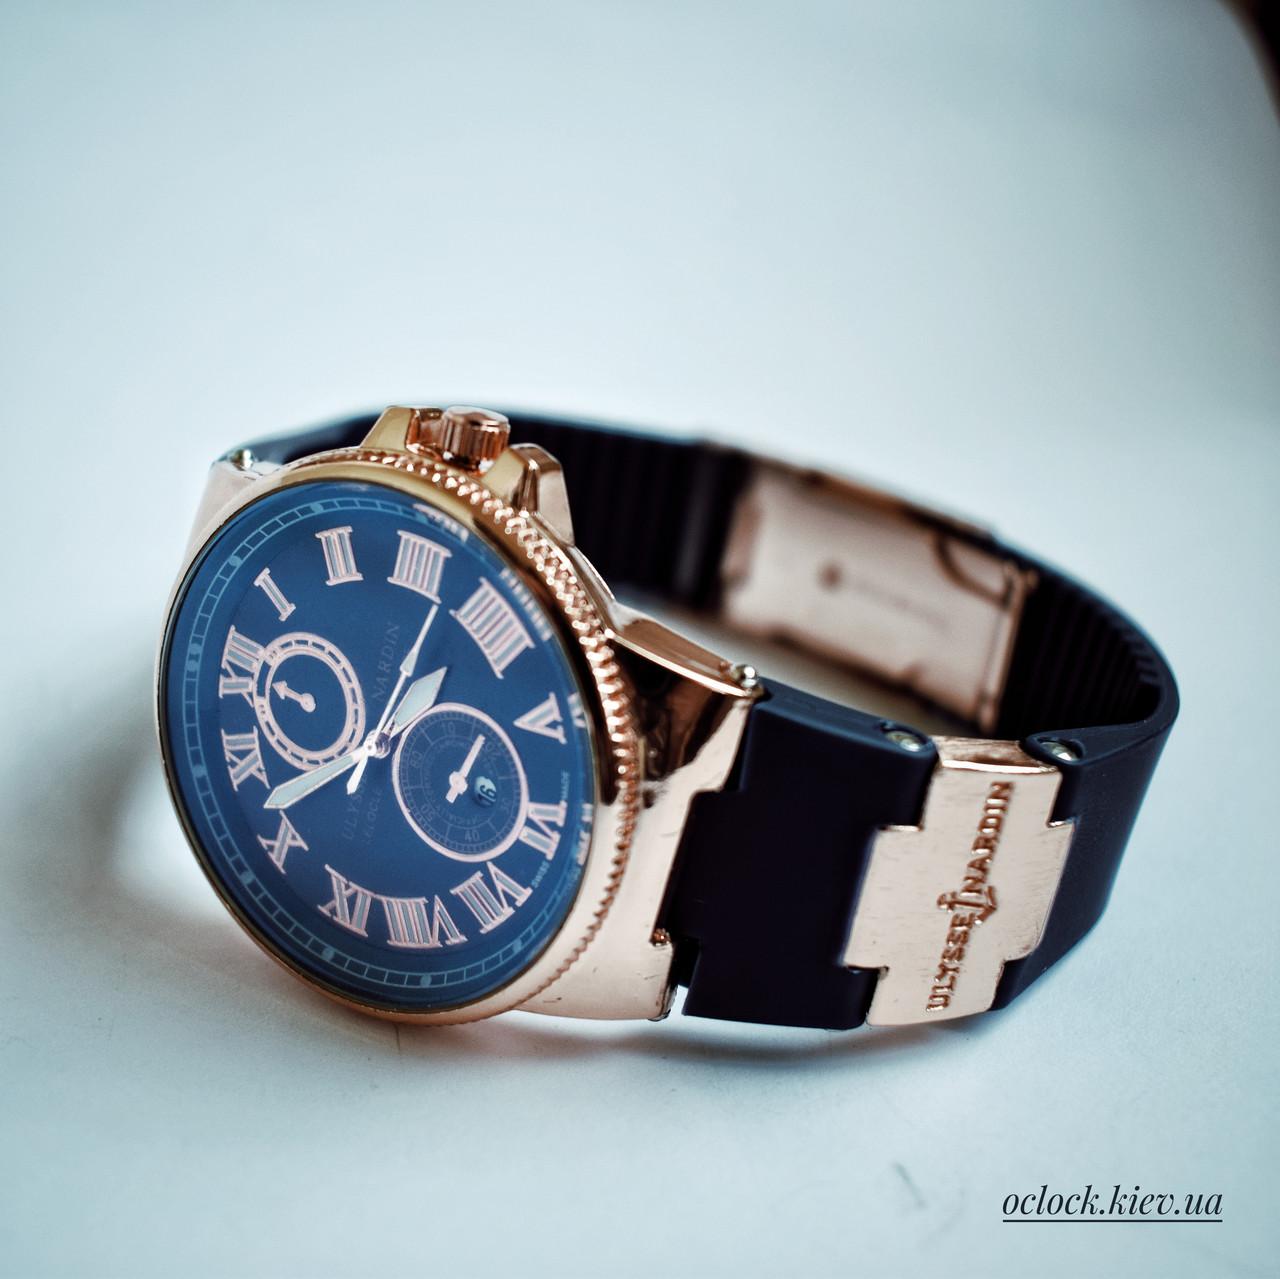 Мужские часы Ulysse Nardin (replica)